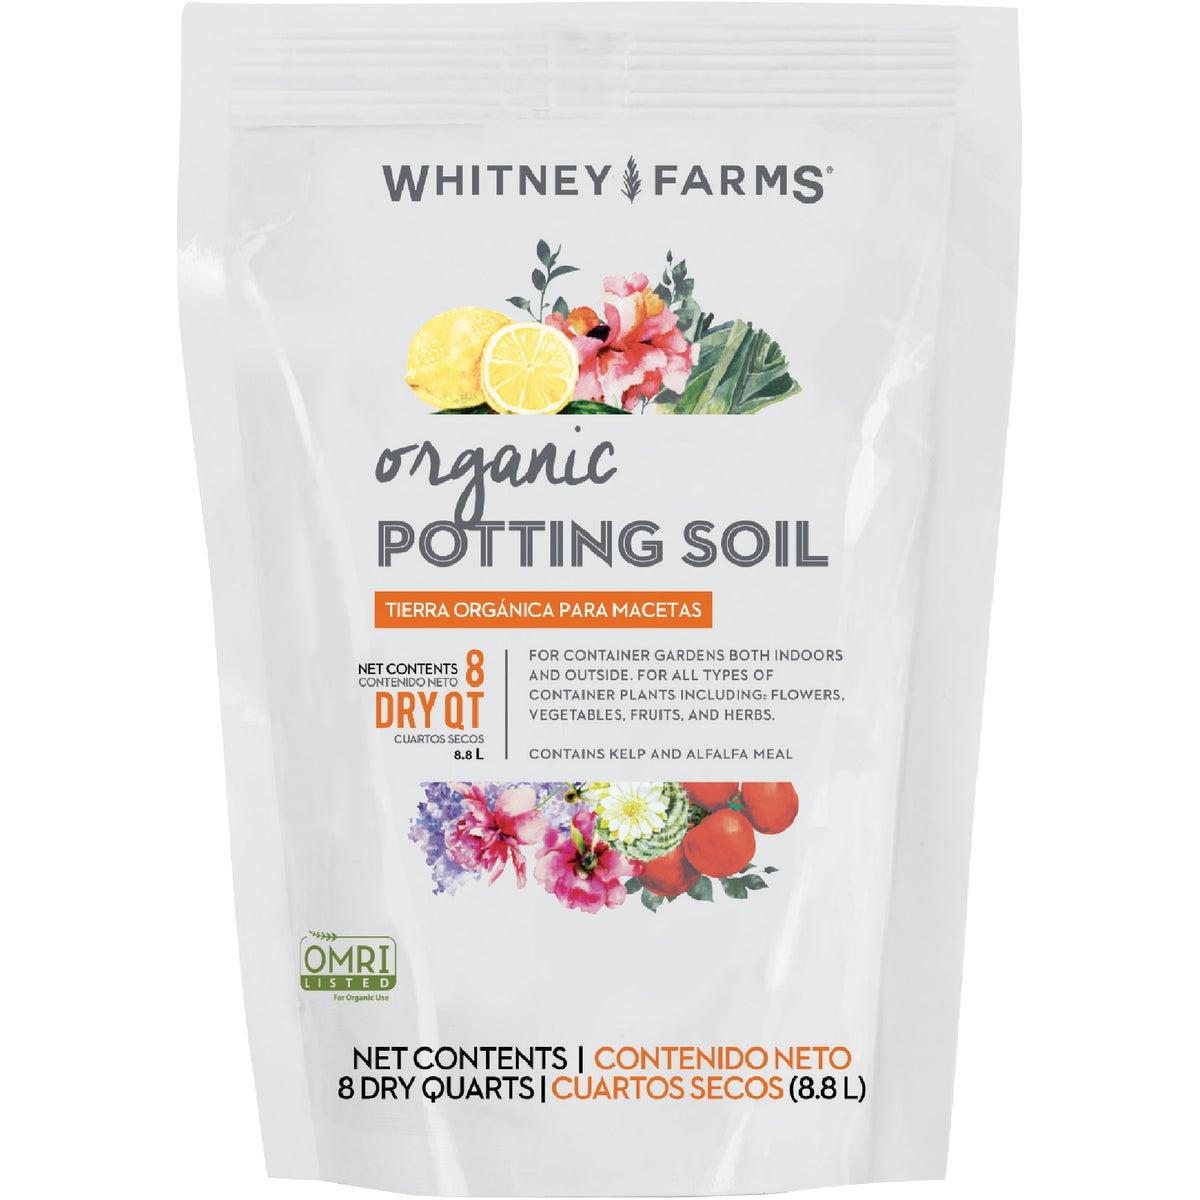 8QT WF ORGANIC POT SOIL - 71678240 by Scotts Organics